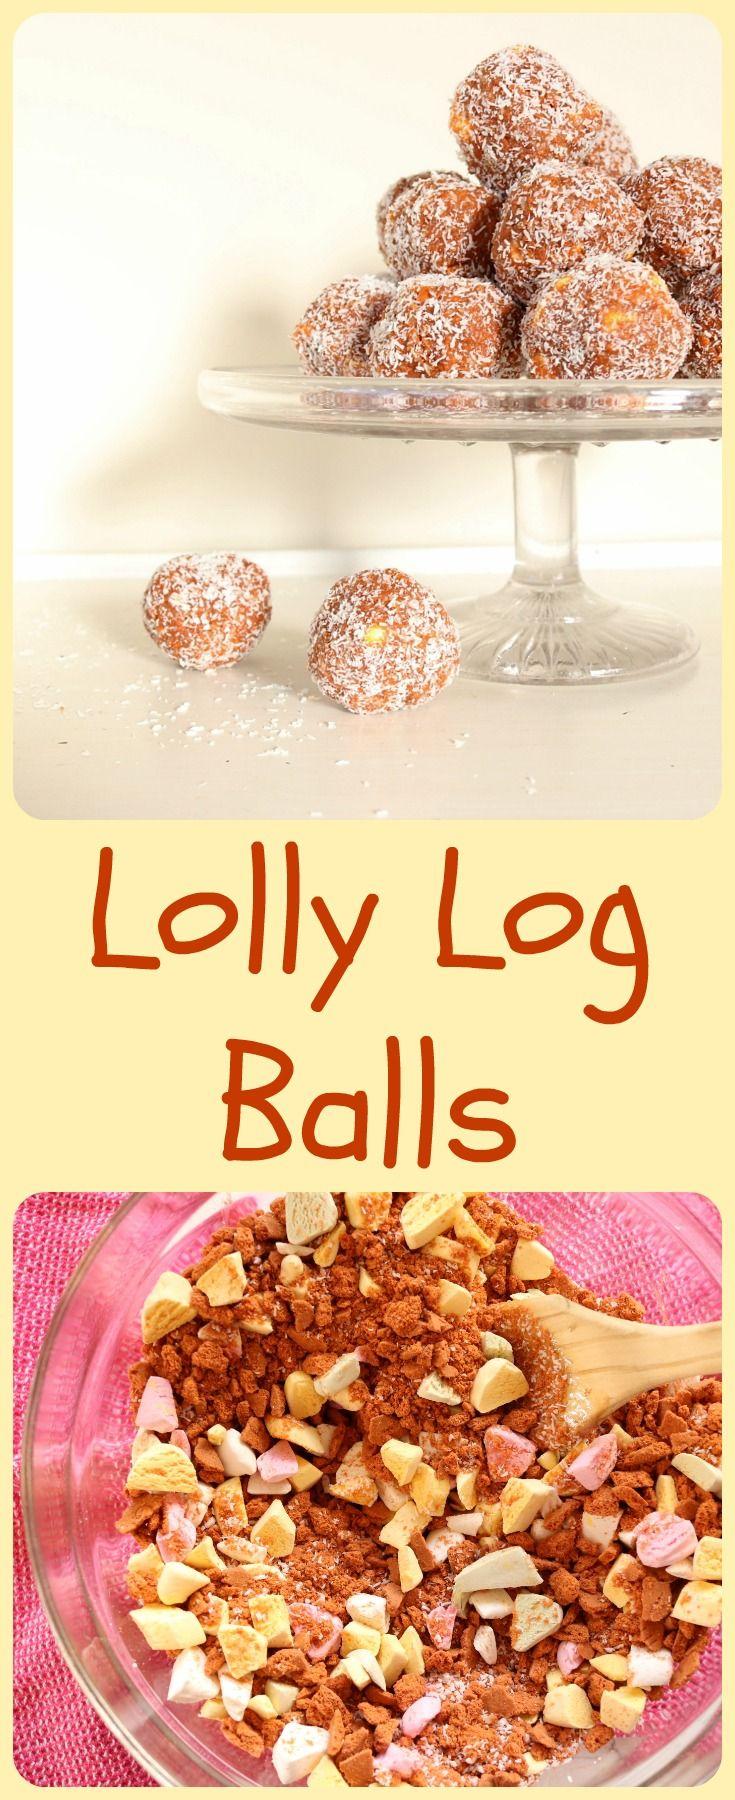 Lolly log white chocolate cheesecake recipe baking